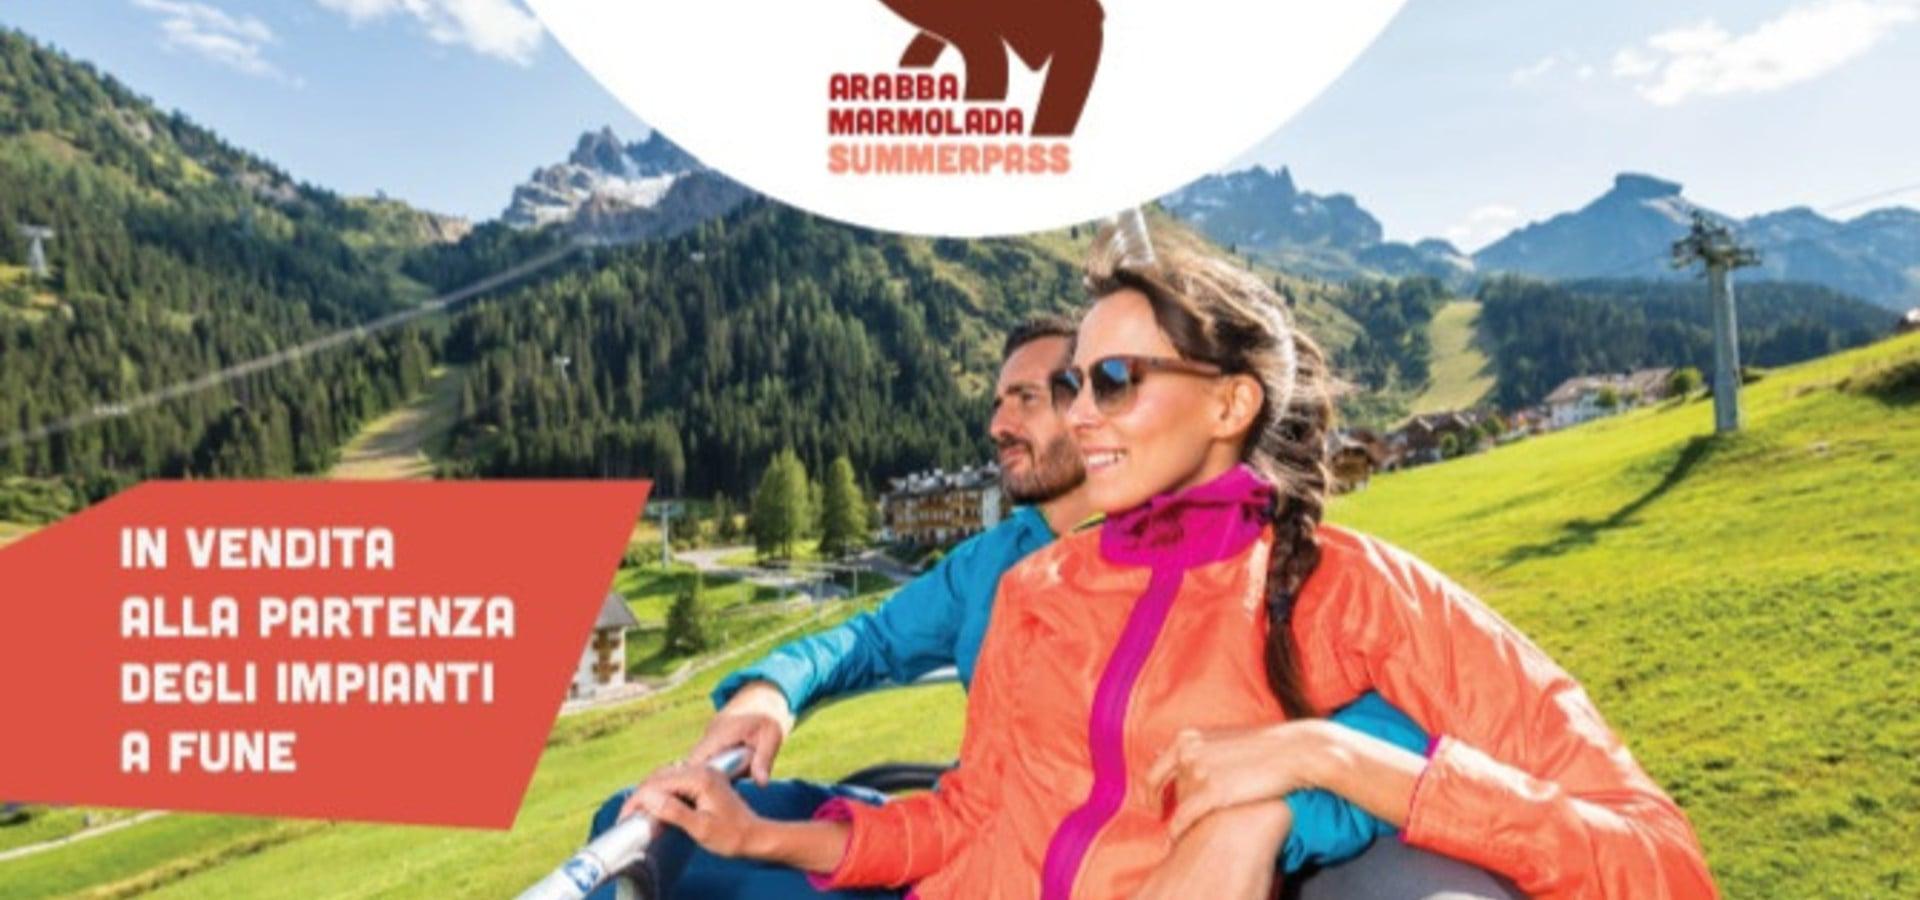 Arabba Marmolada Summer Pass